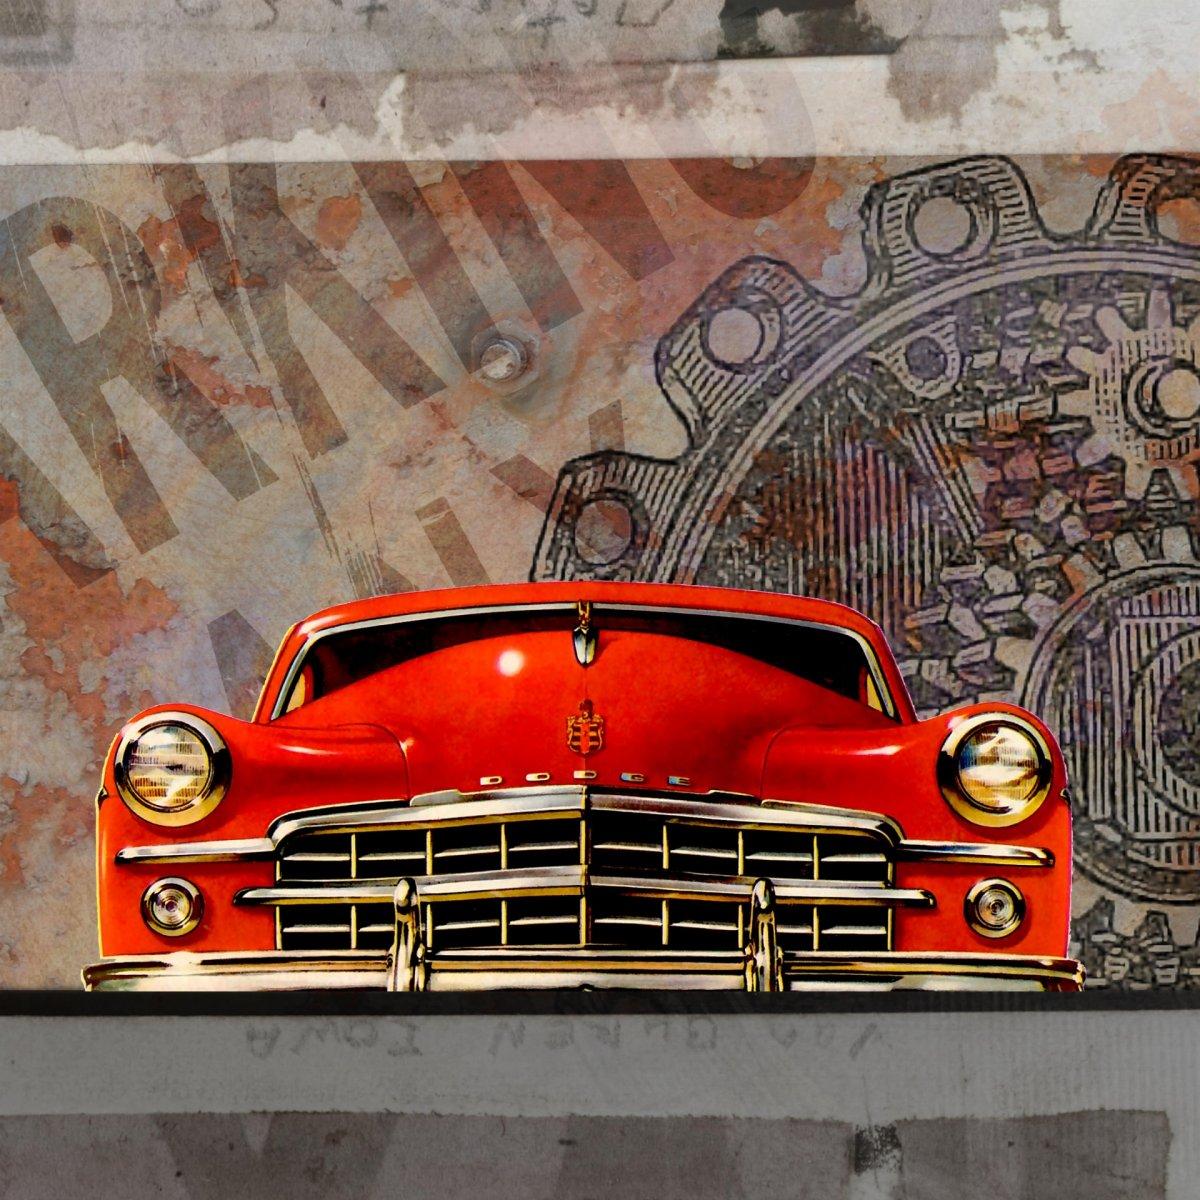 vintage-car-art-collage-1923-14583751269hf.jpg